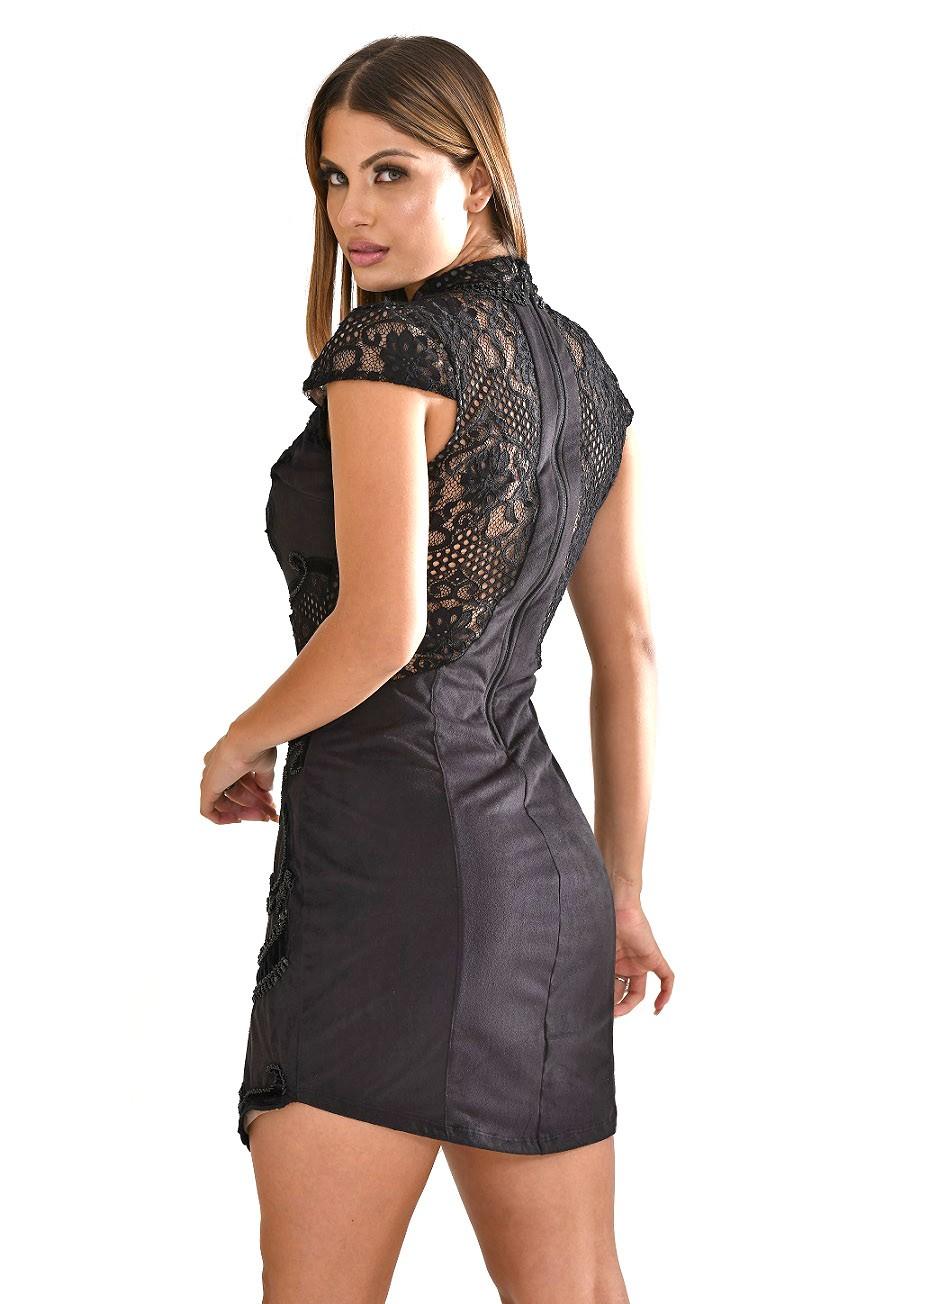 Vestido de suede com decote de tule e bordado